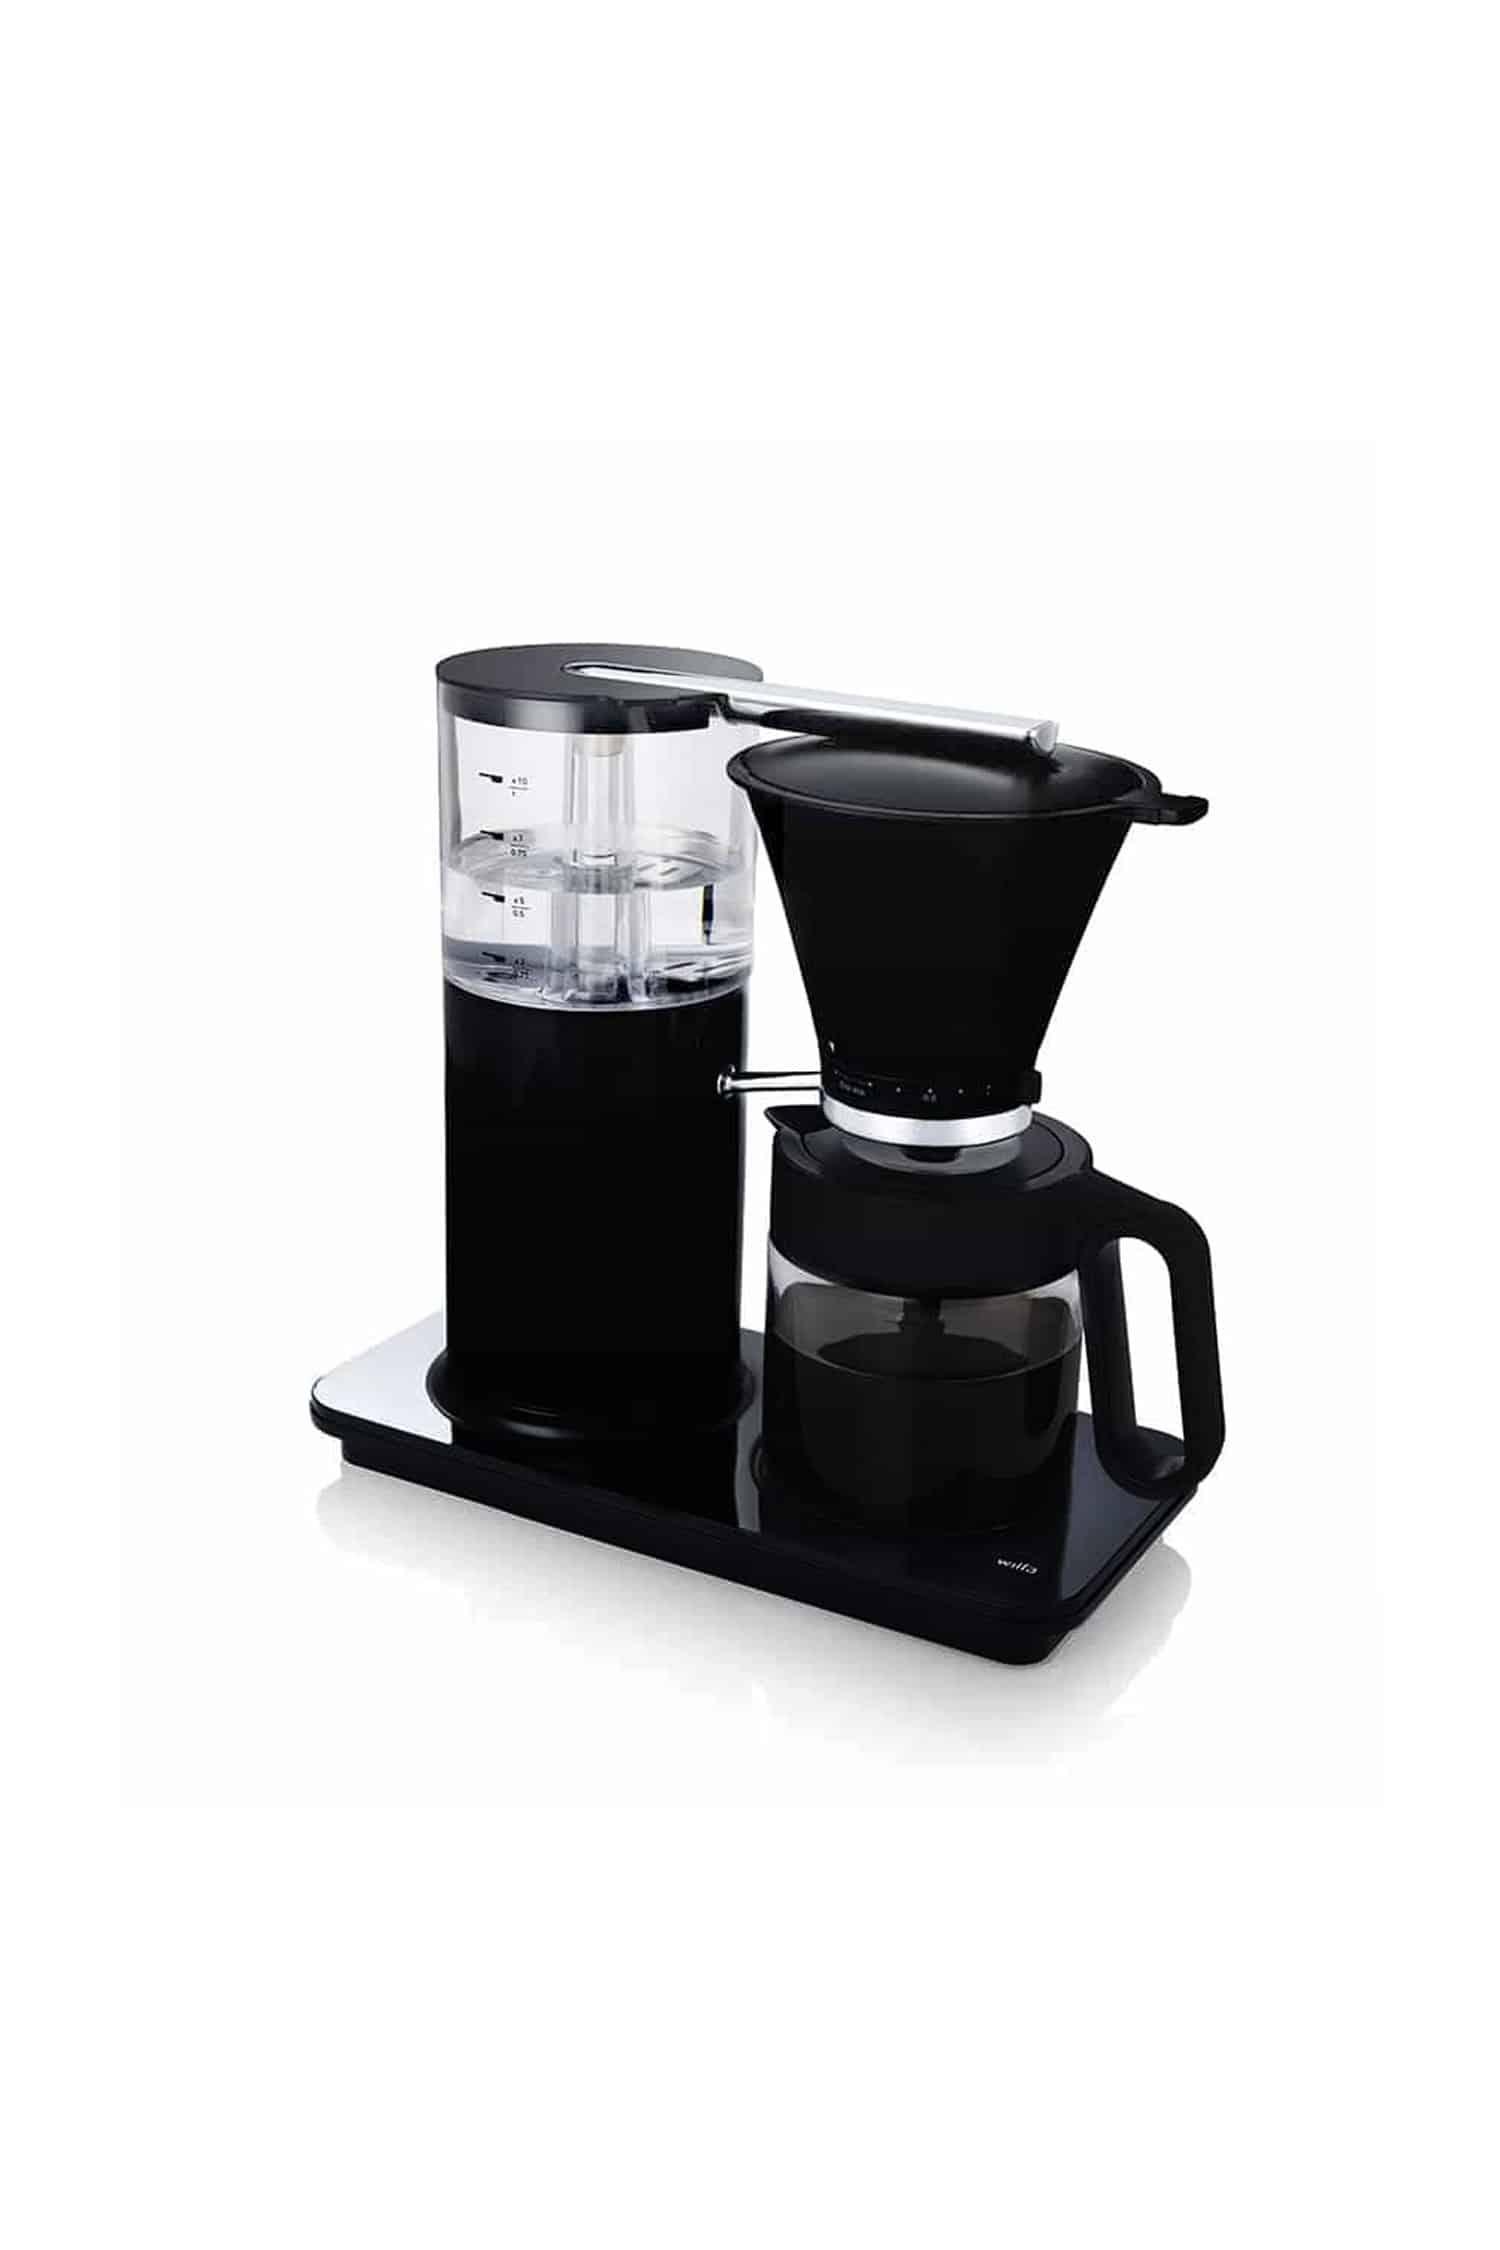 Wilfa Classic Plus Coffee Maker